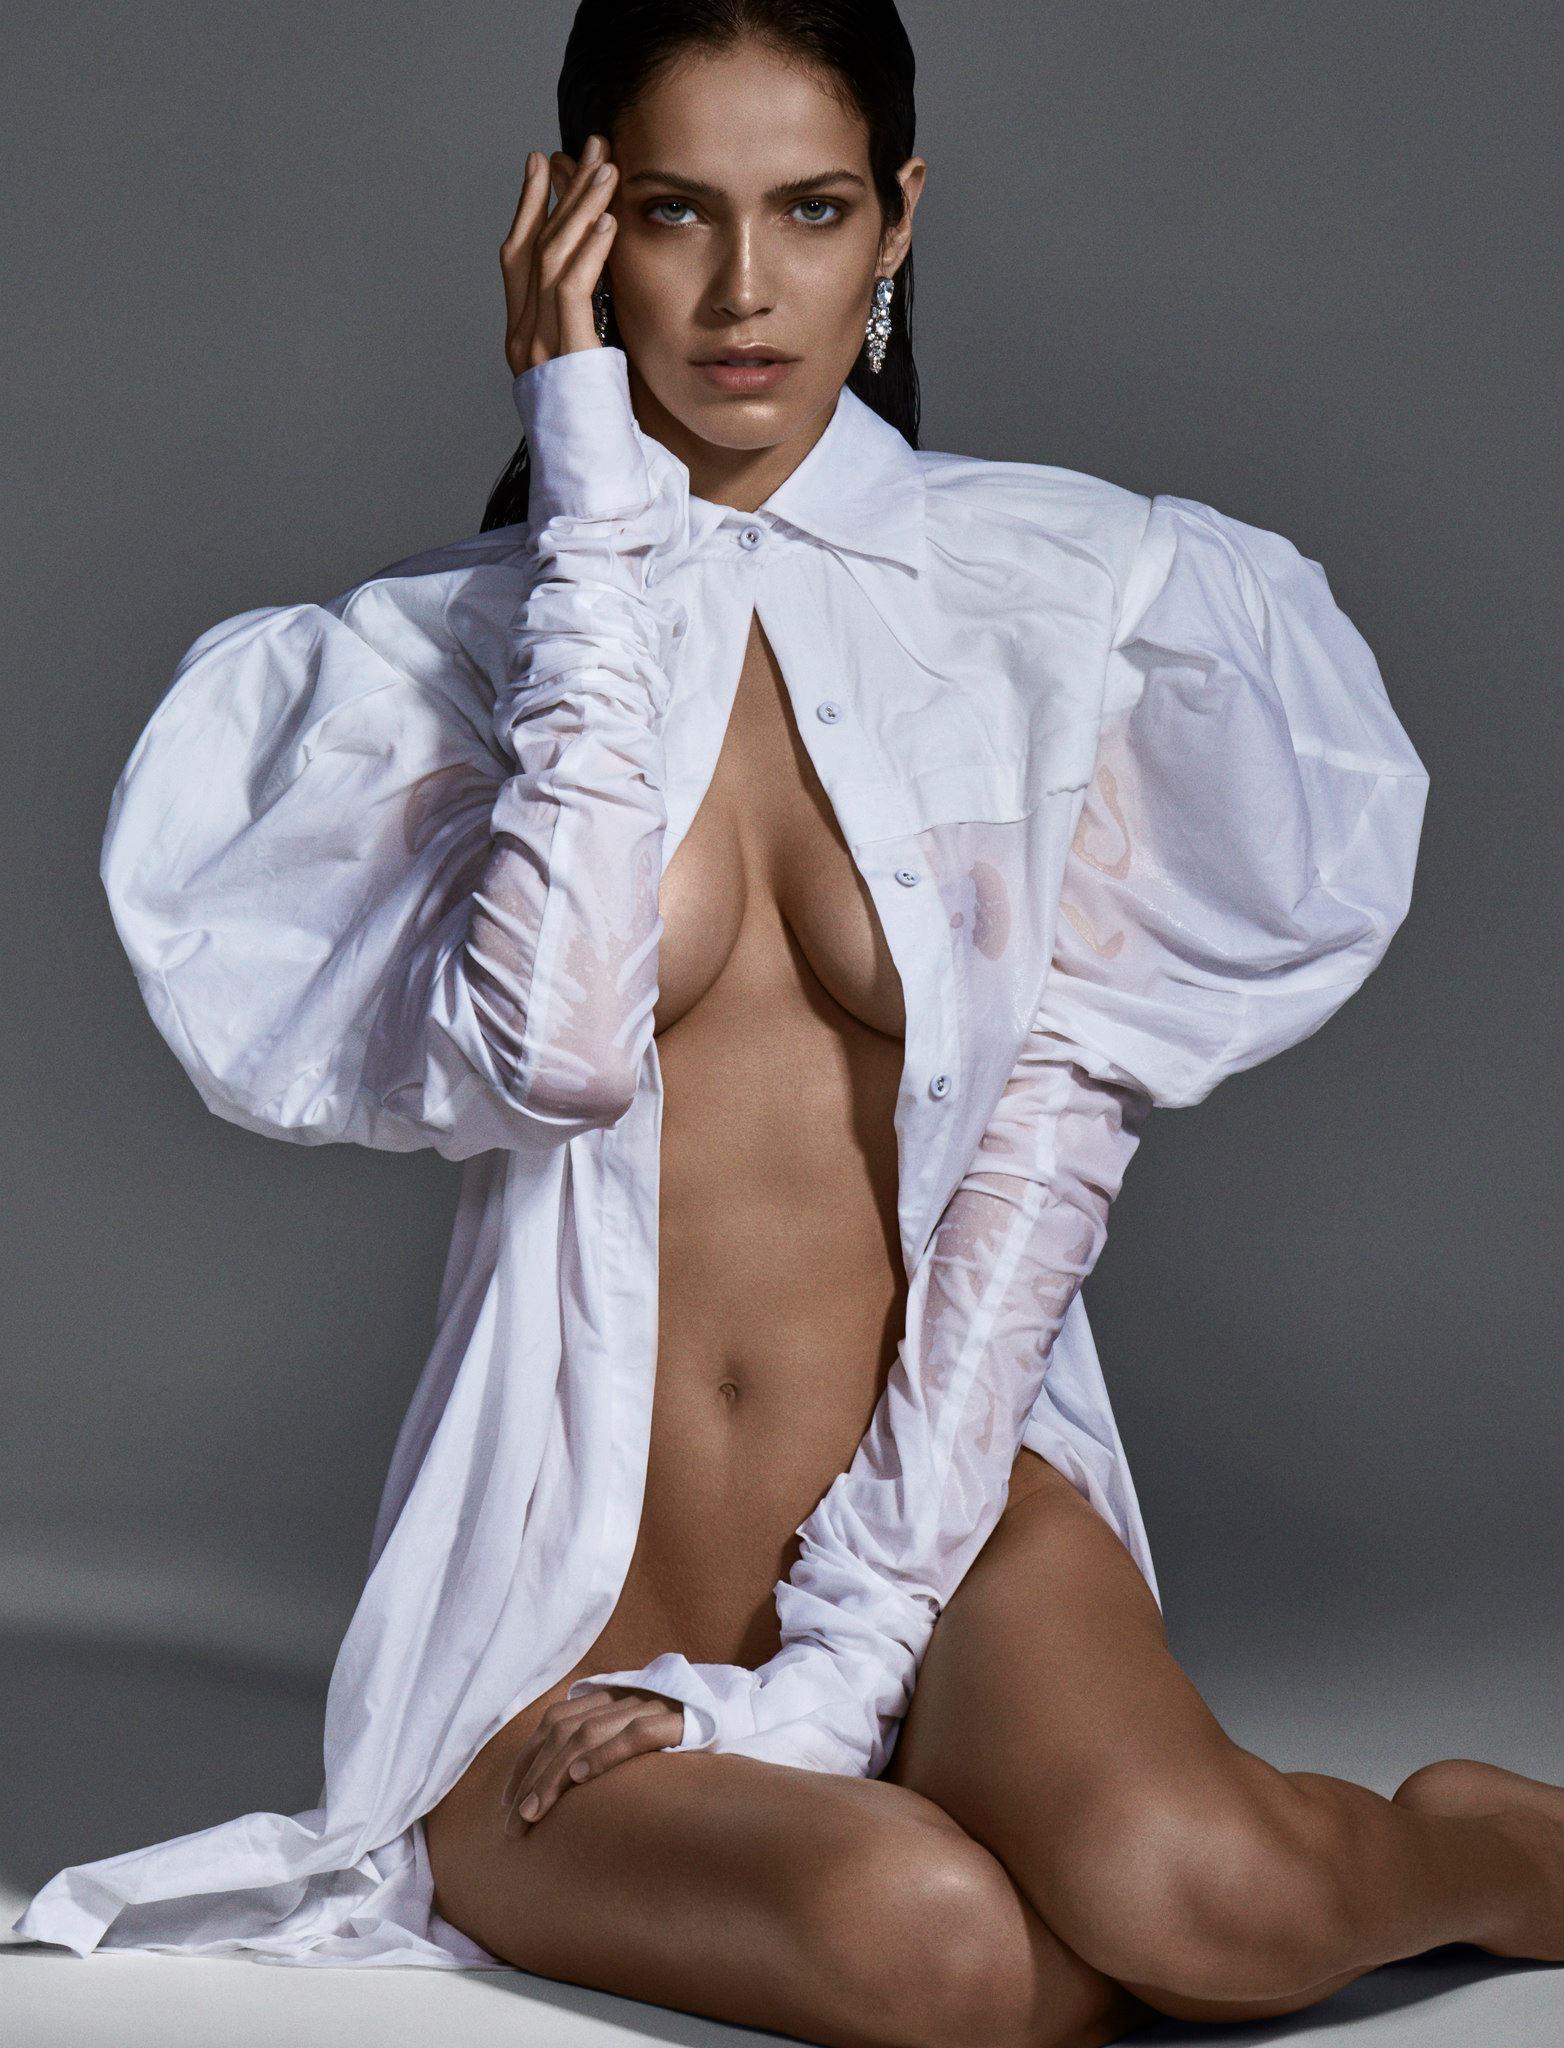 Instagram Masika Kalysha naked (32 photo), Tits, Sideboobs, Feet, butt 2006